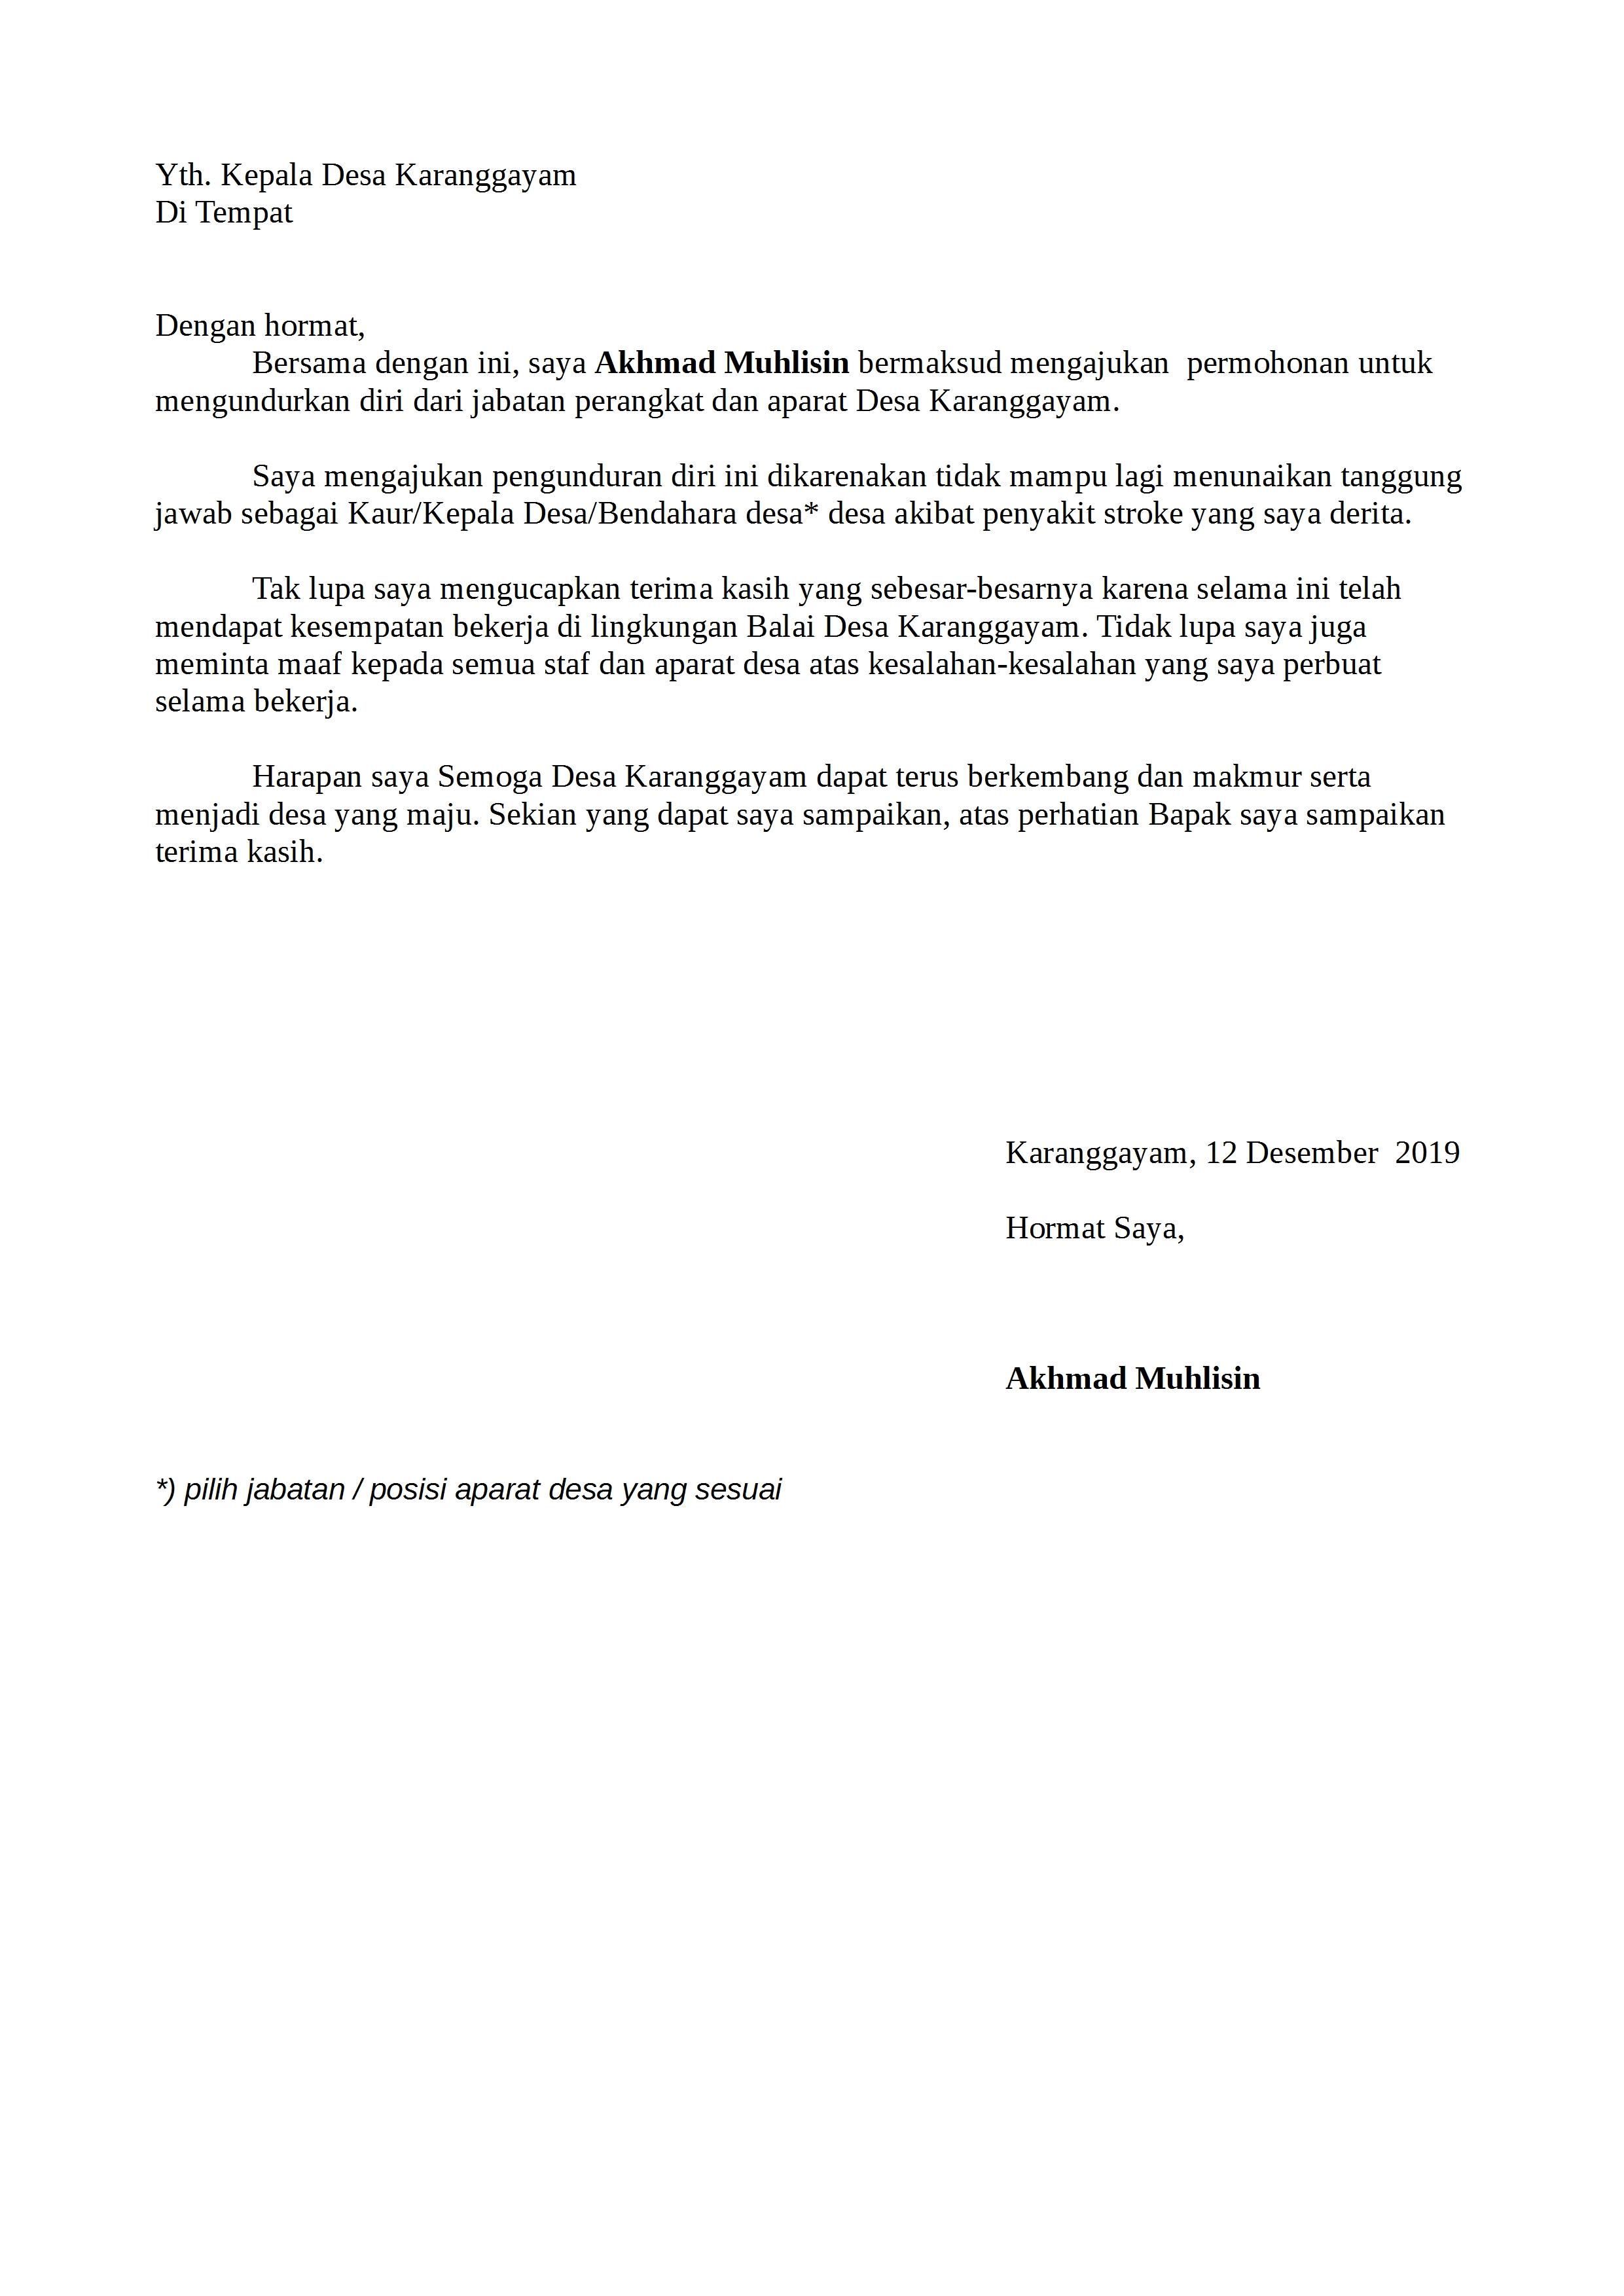 Contoh Surat Pengunduran Diri Pt Indomarco Prismatama